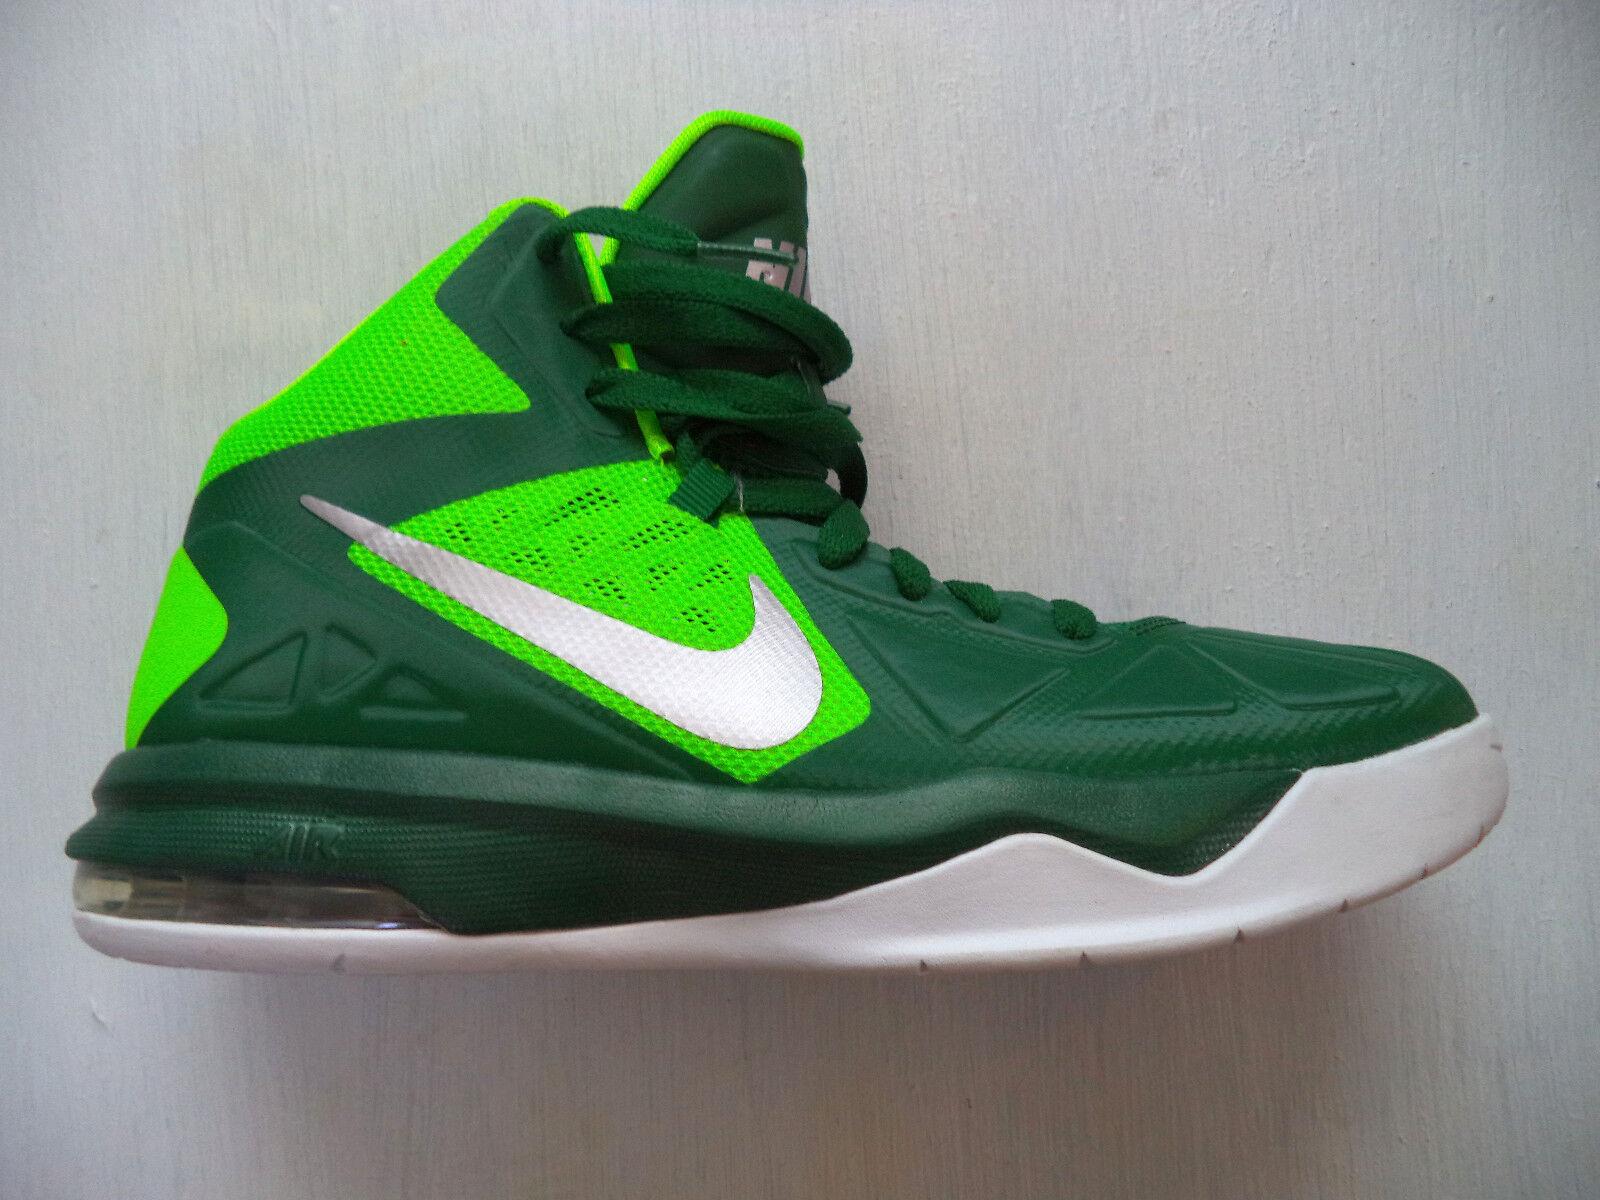 Womens NIKE baskeball style shoes Sz 9 hoops pro sneakers court pro fashion